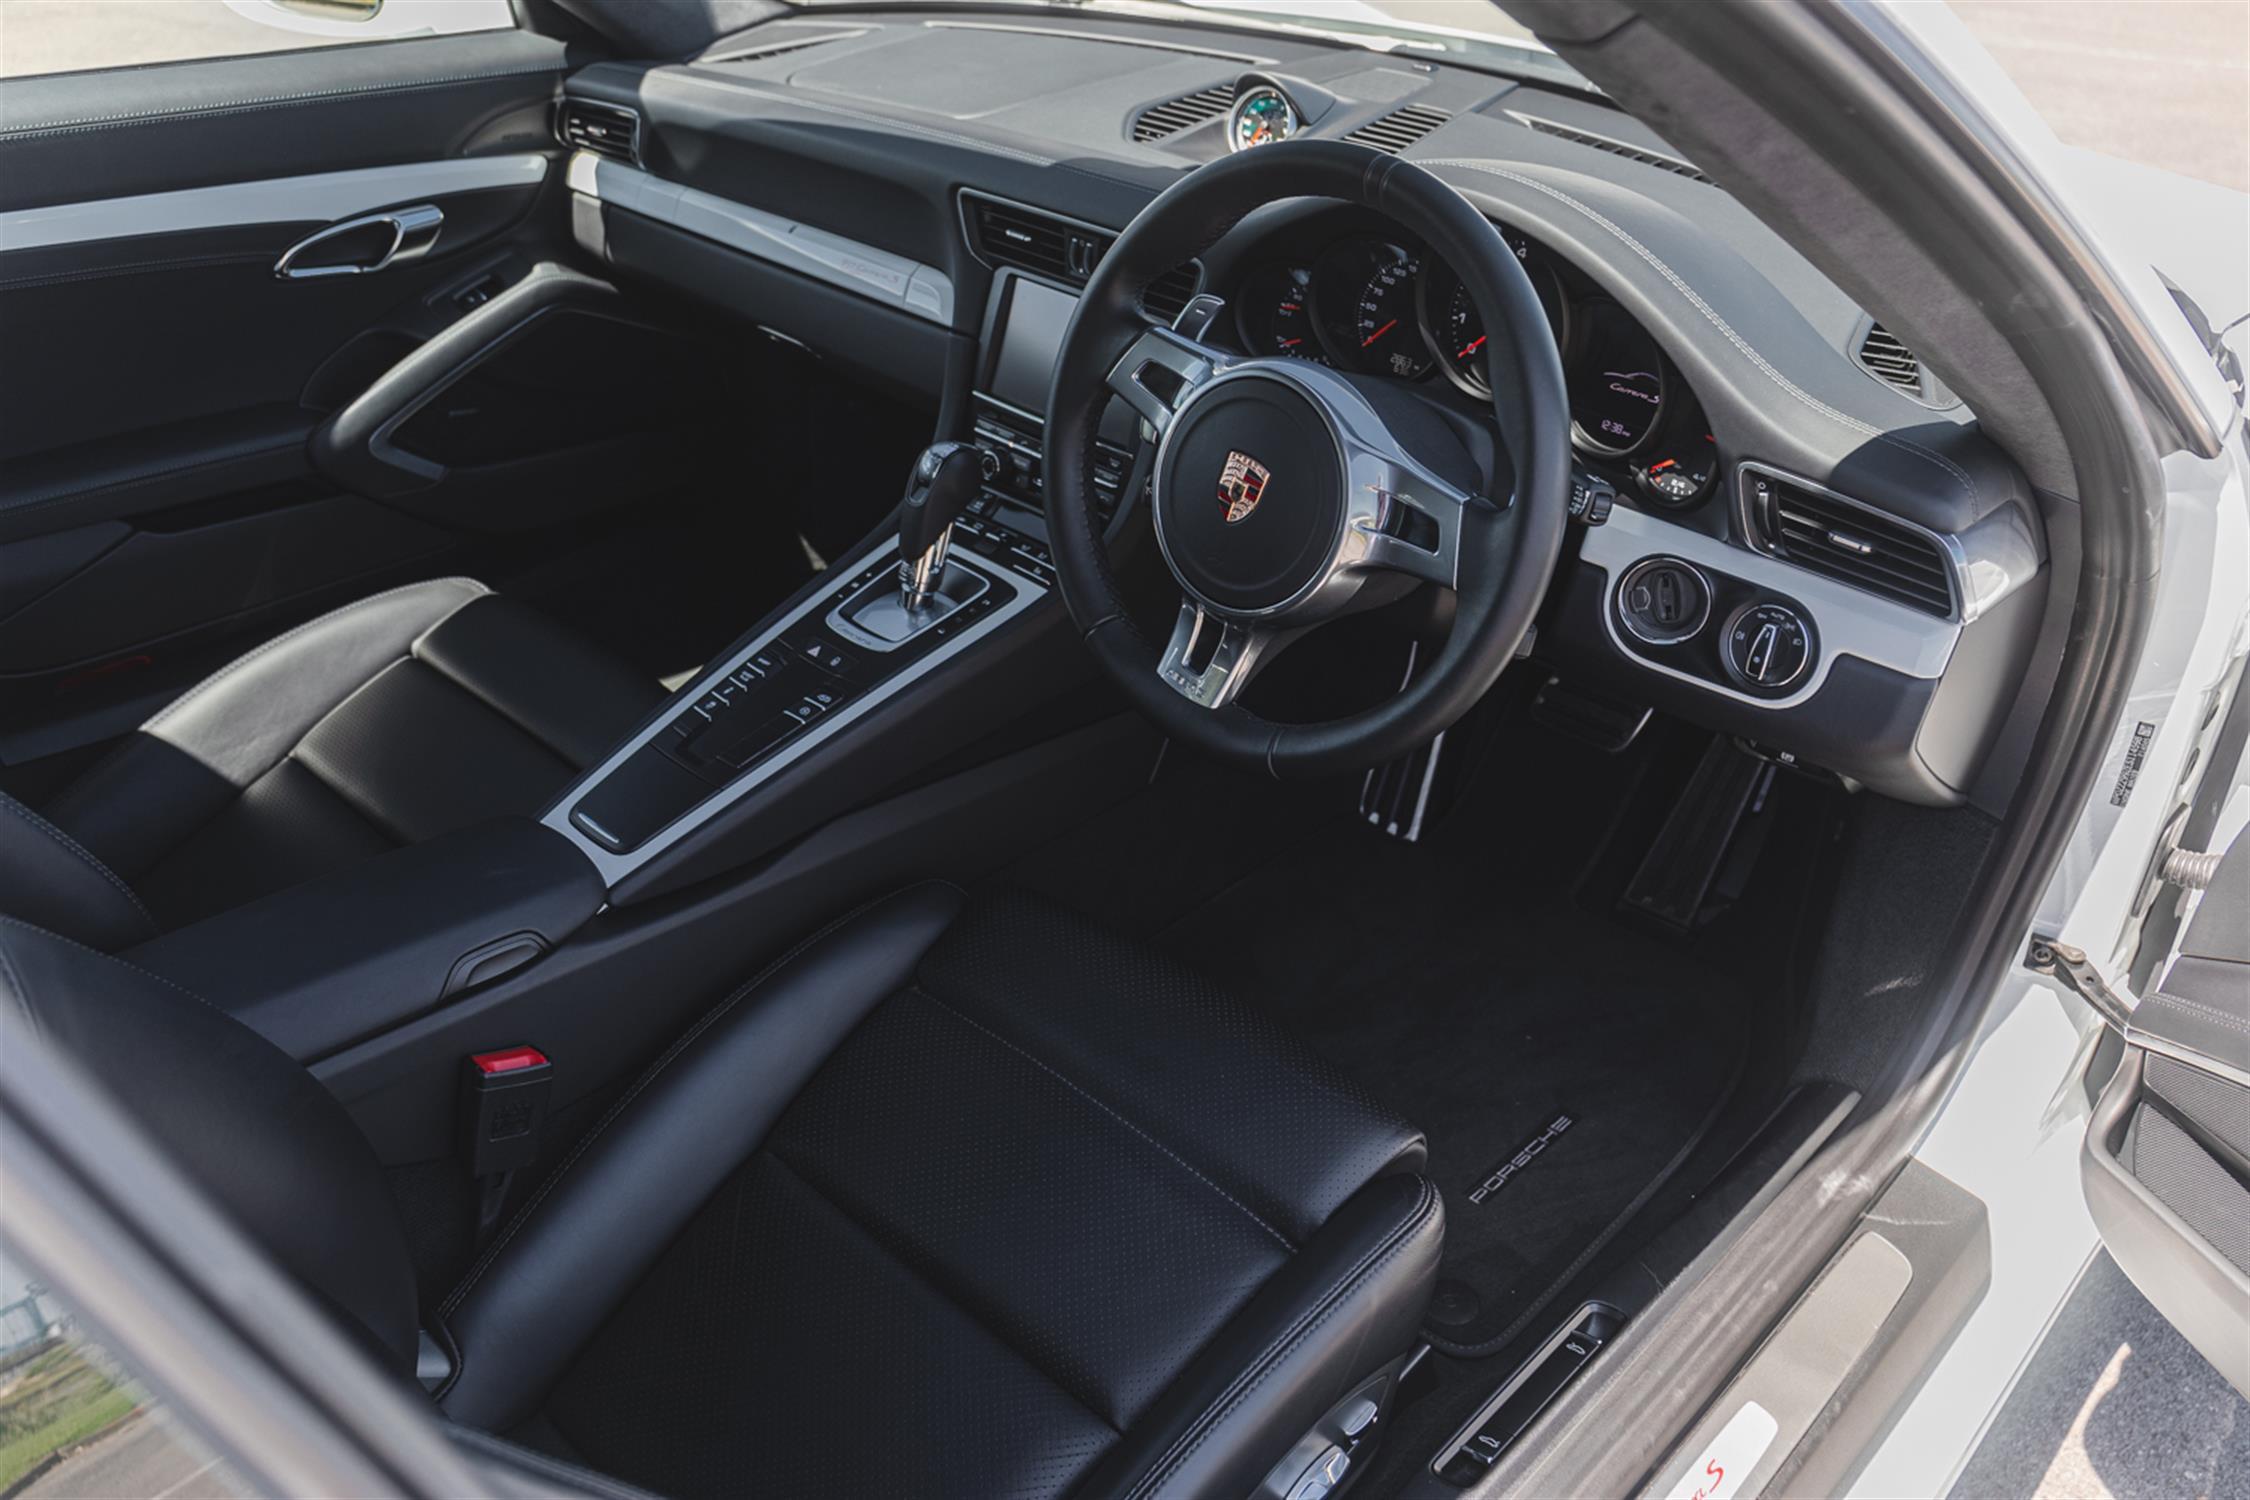 2014 Porsche 911 (991) 3.8 Martini Racing Edition (RHD) - Image 6 of 10